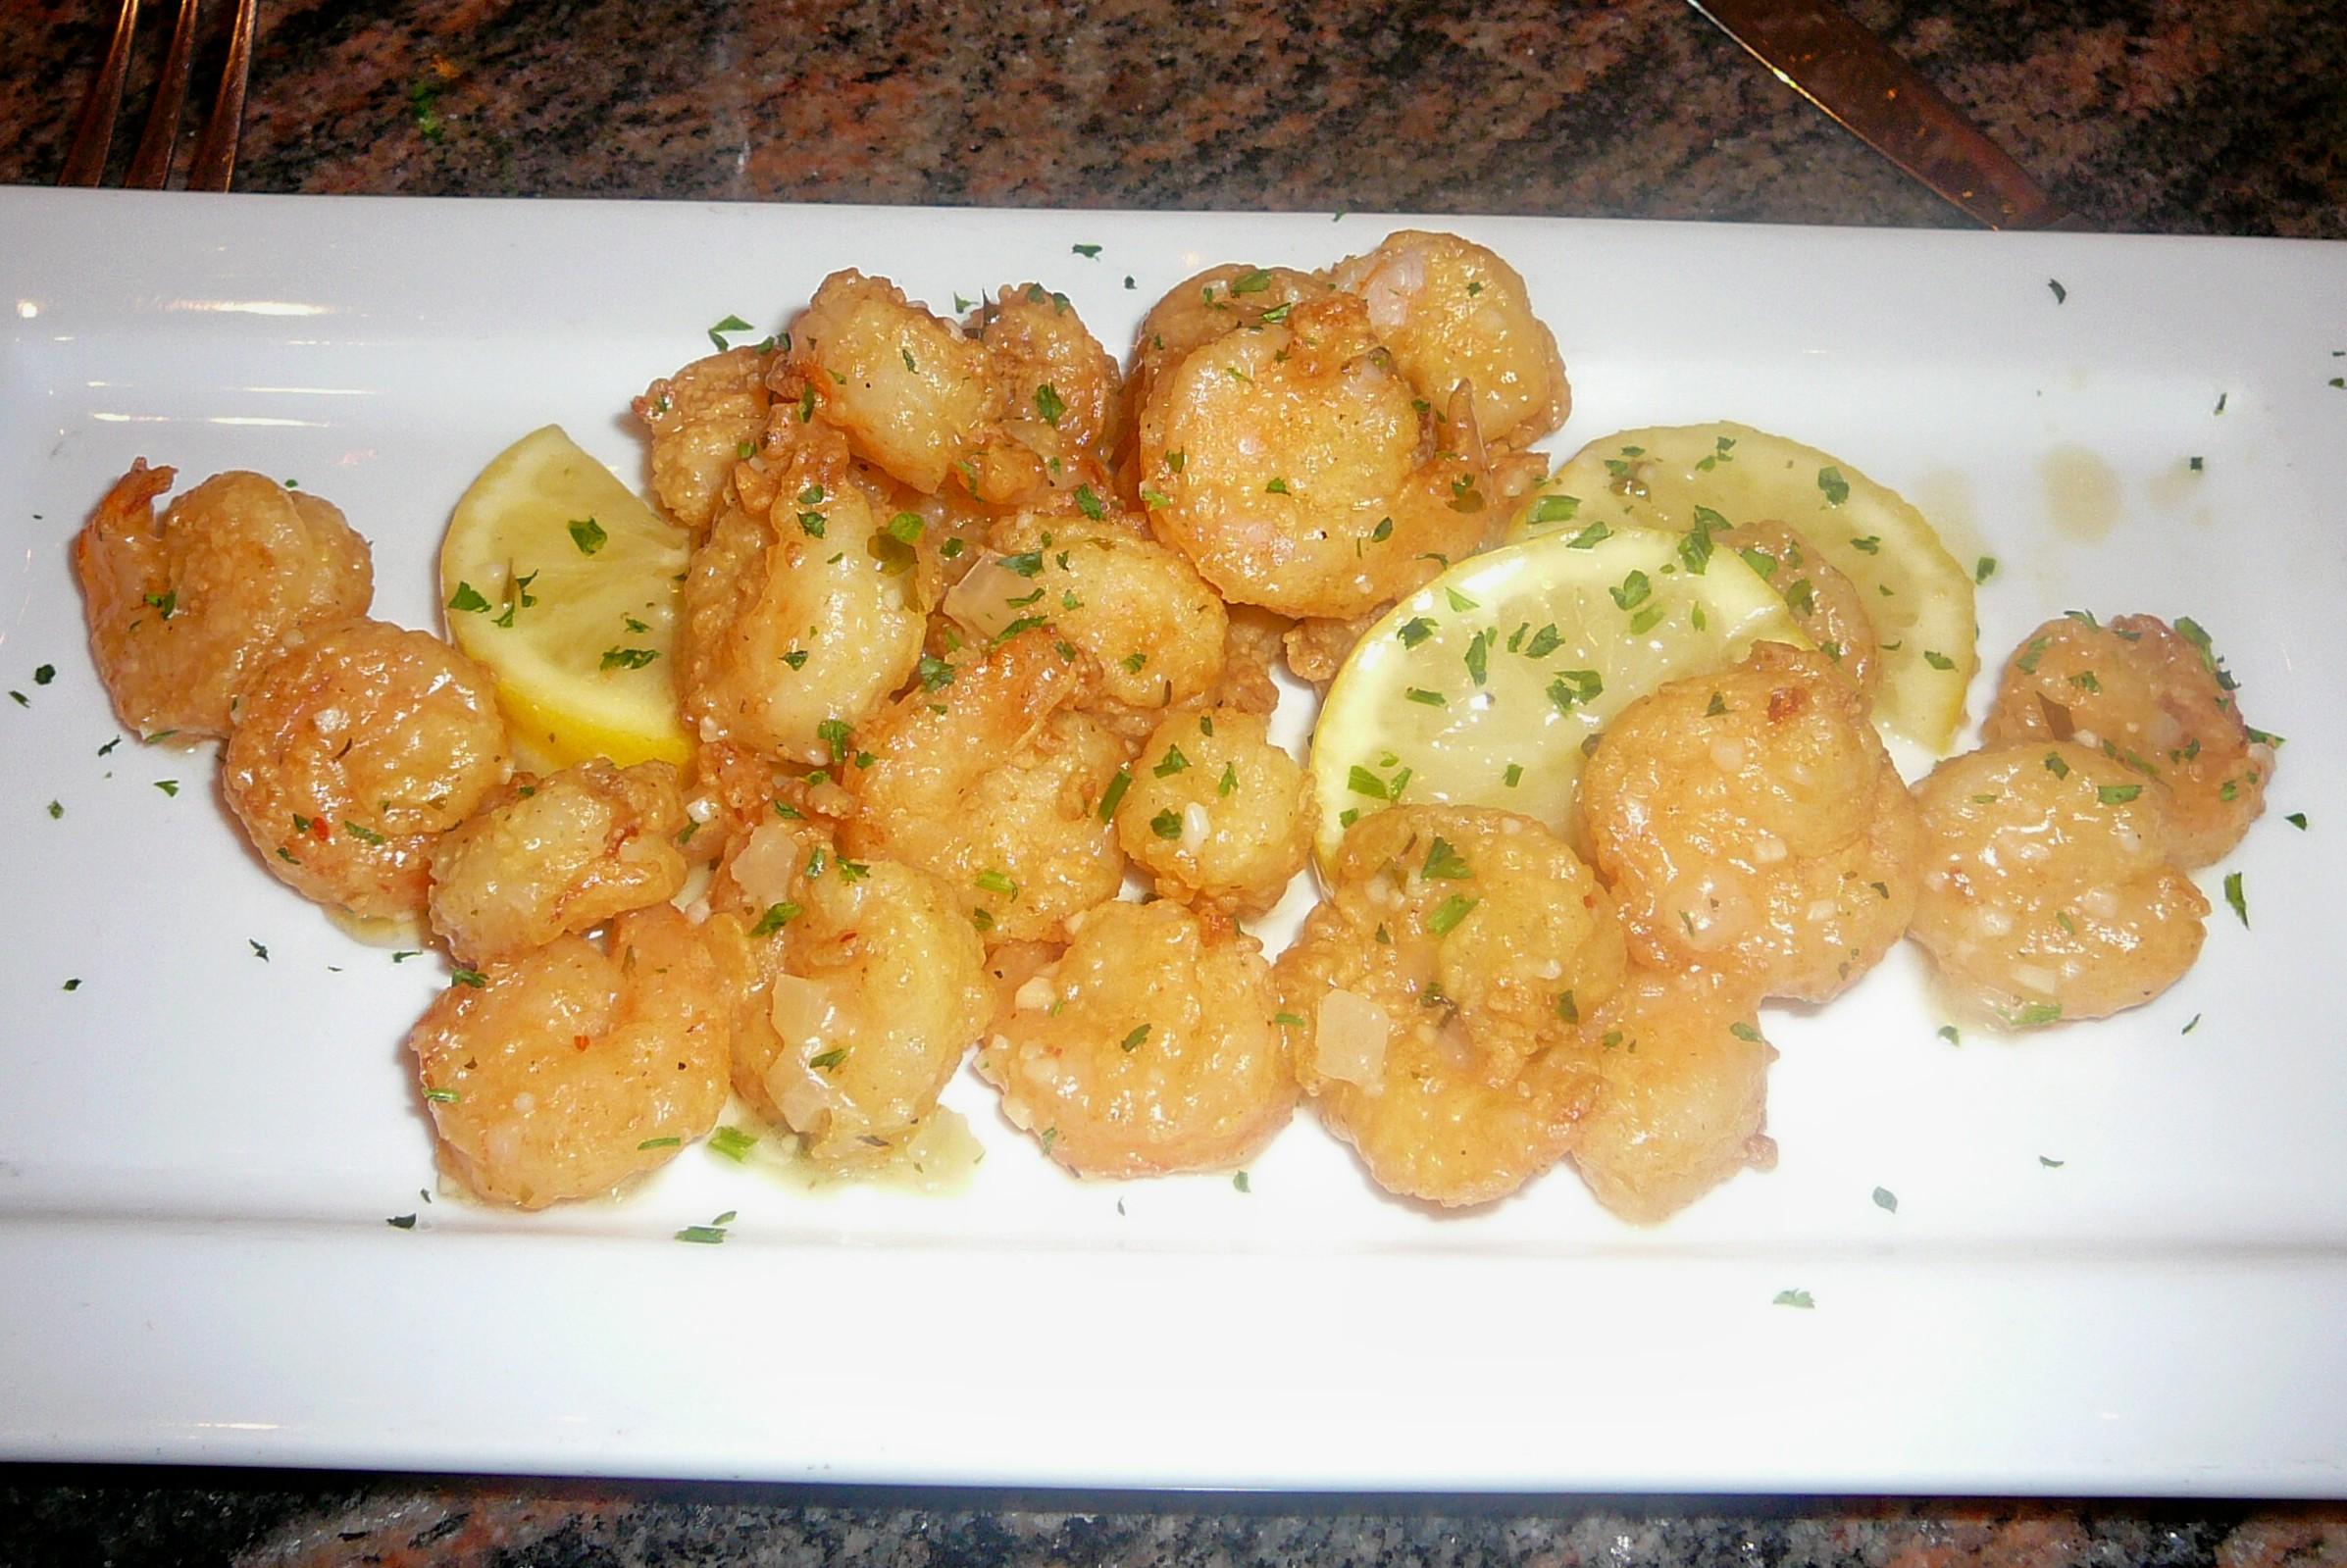 Olive garden for Olive garden shrimp scampi fritta